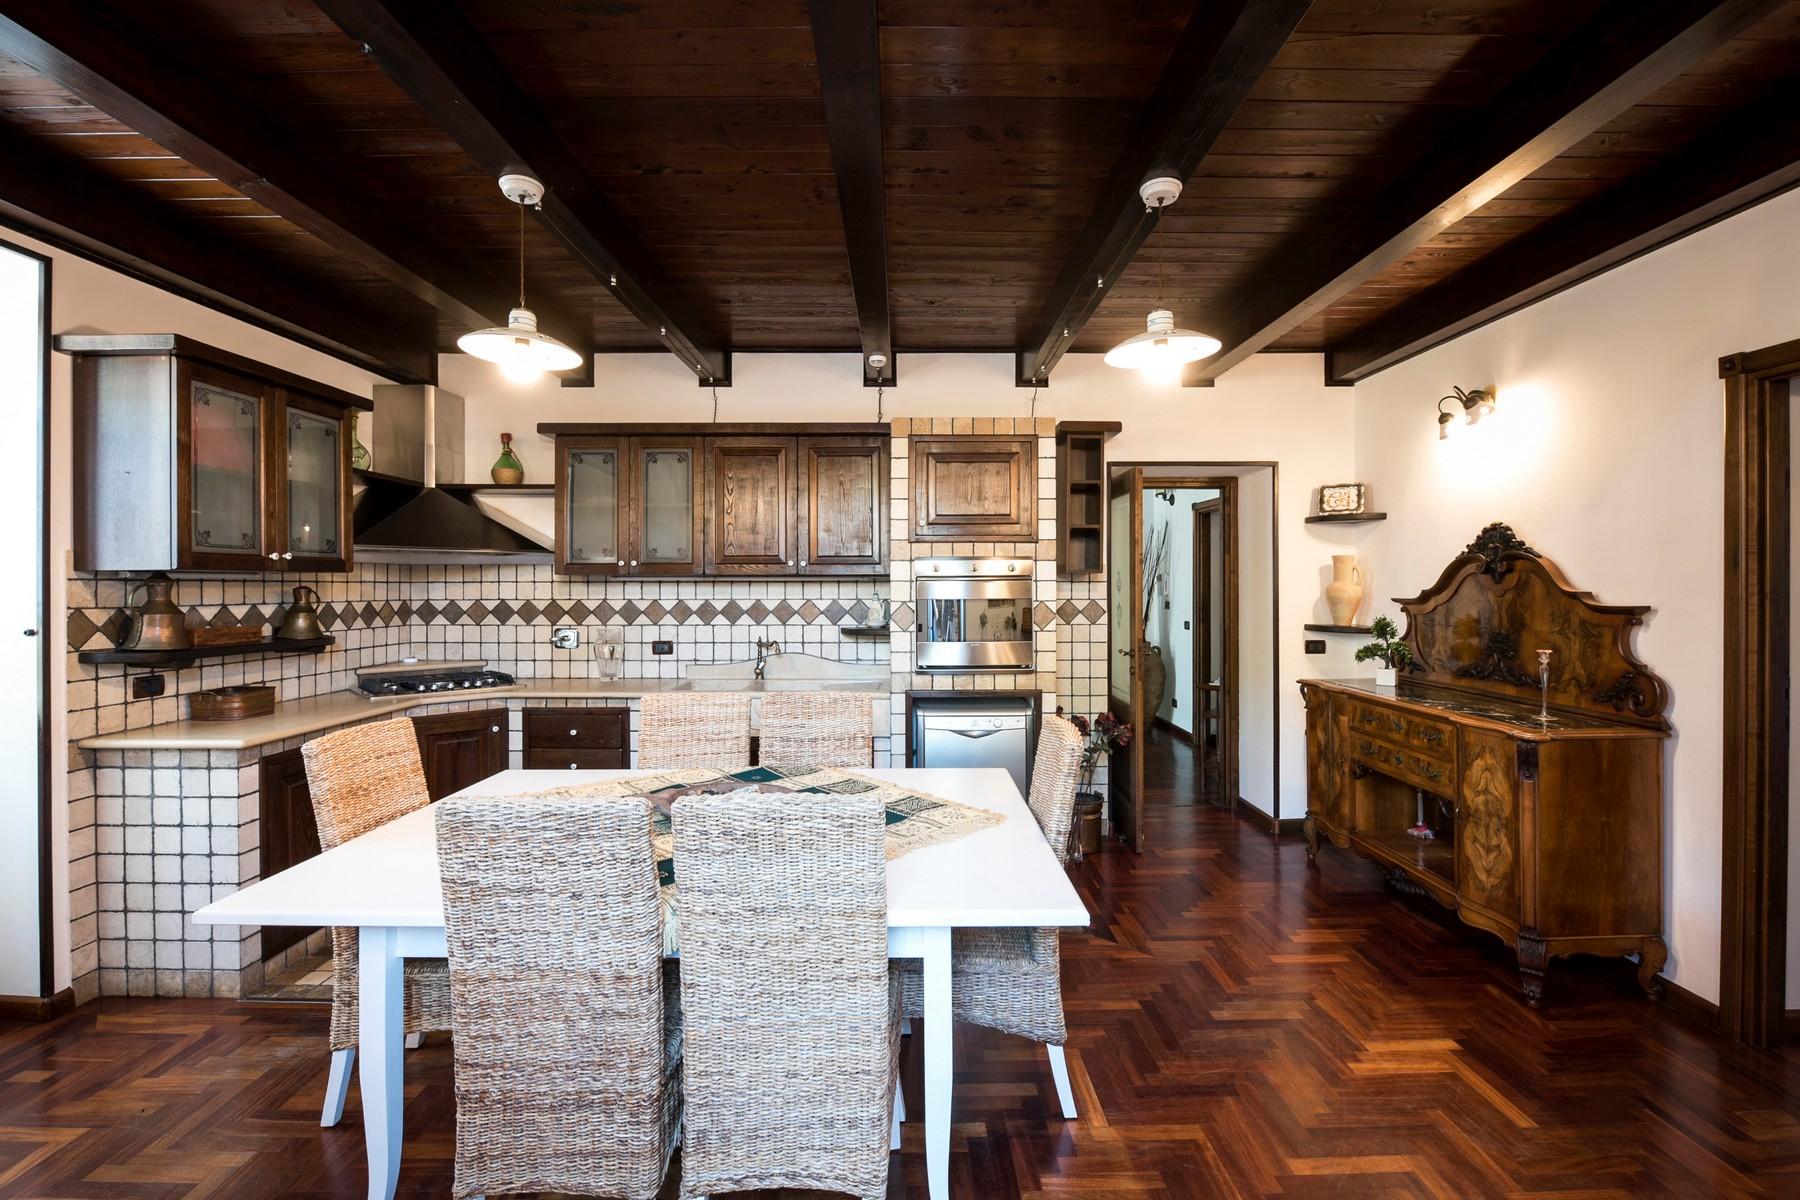 Casa indipendente in Vendita a Noto: 5 locali, 300 mq - Foto 14